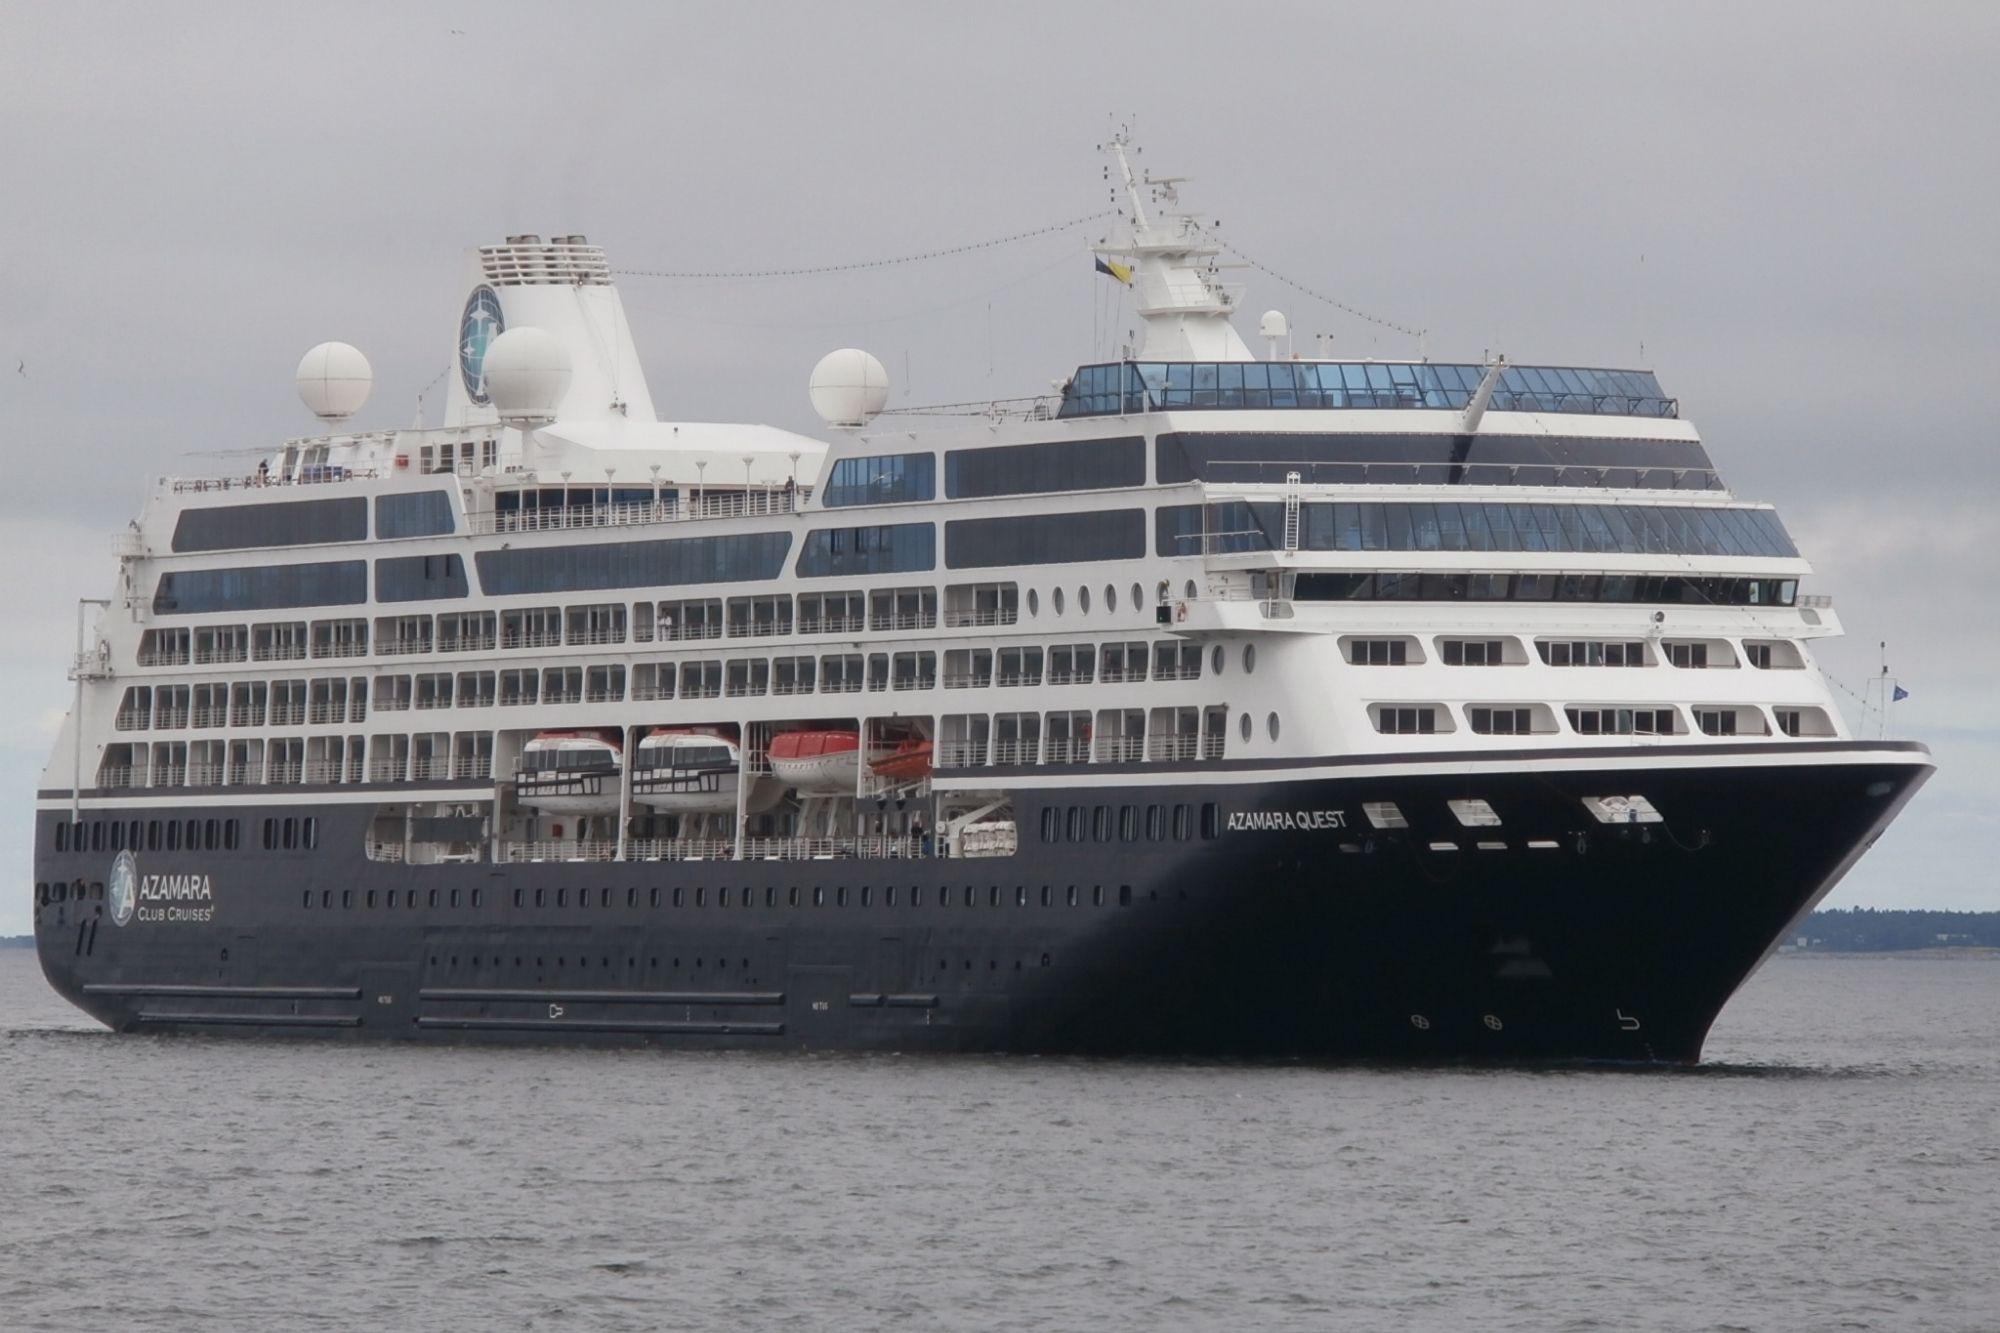 Royal Caribbean Group verkauft Kreuzfahrt-Marke ,,Azamara'' für 201 Millionen US-Dollar